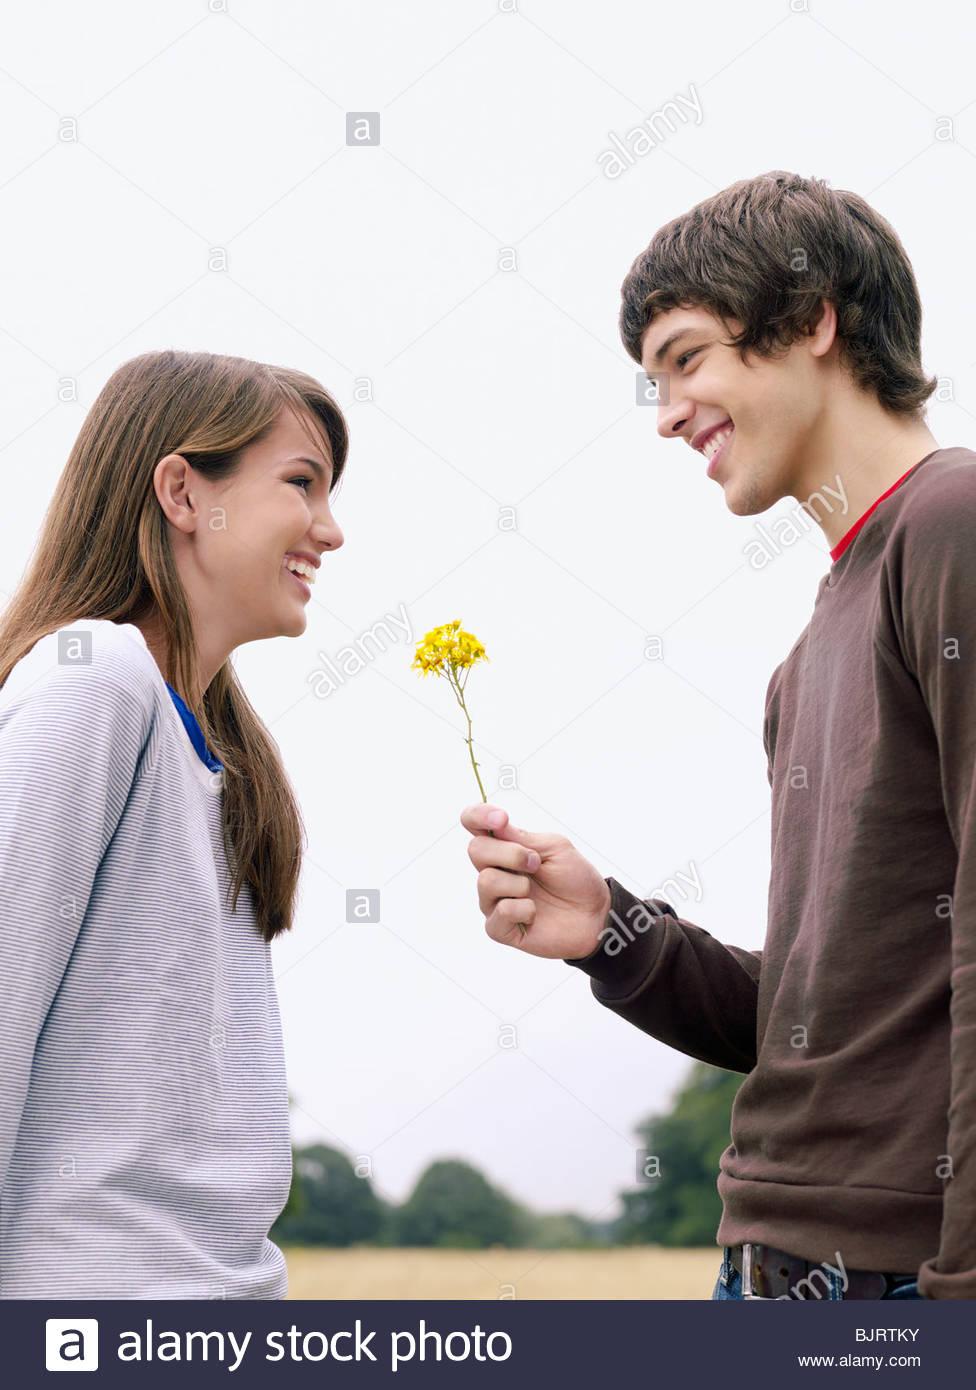 boy giving girl a flower stock photo 28798447 alamy